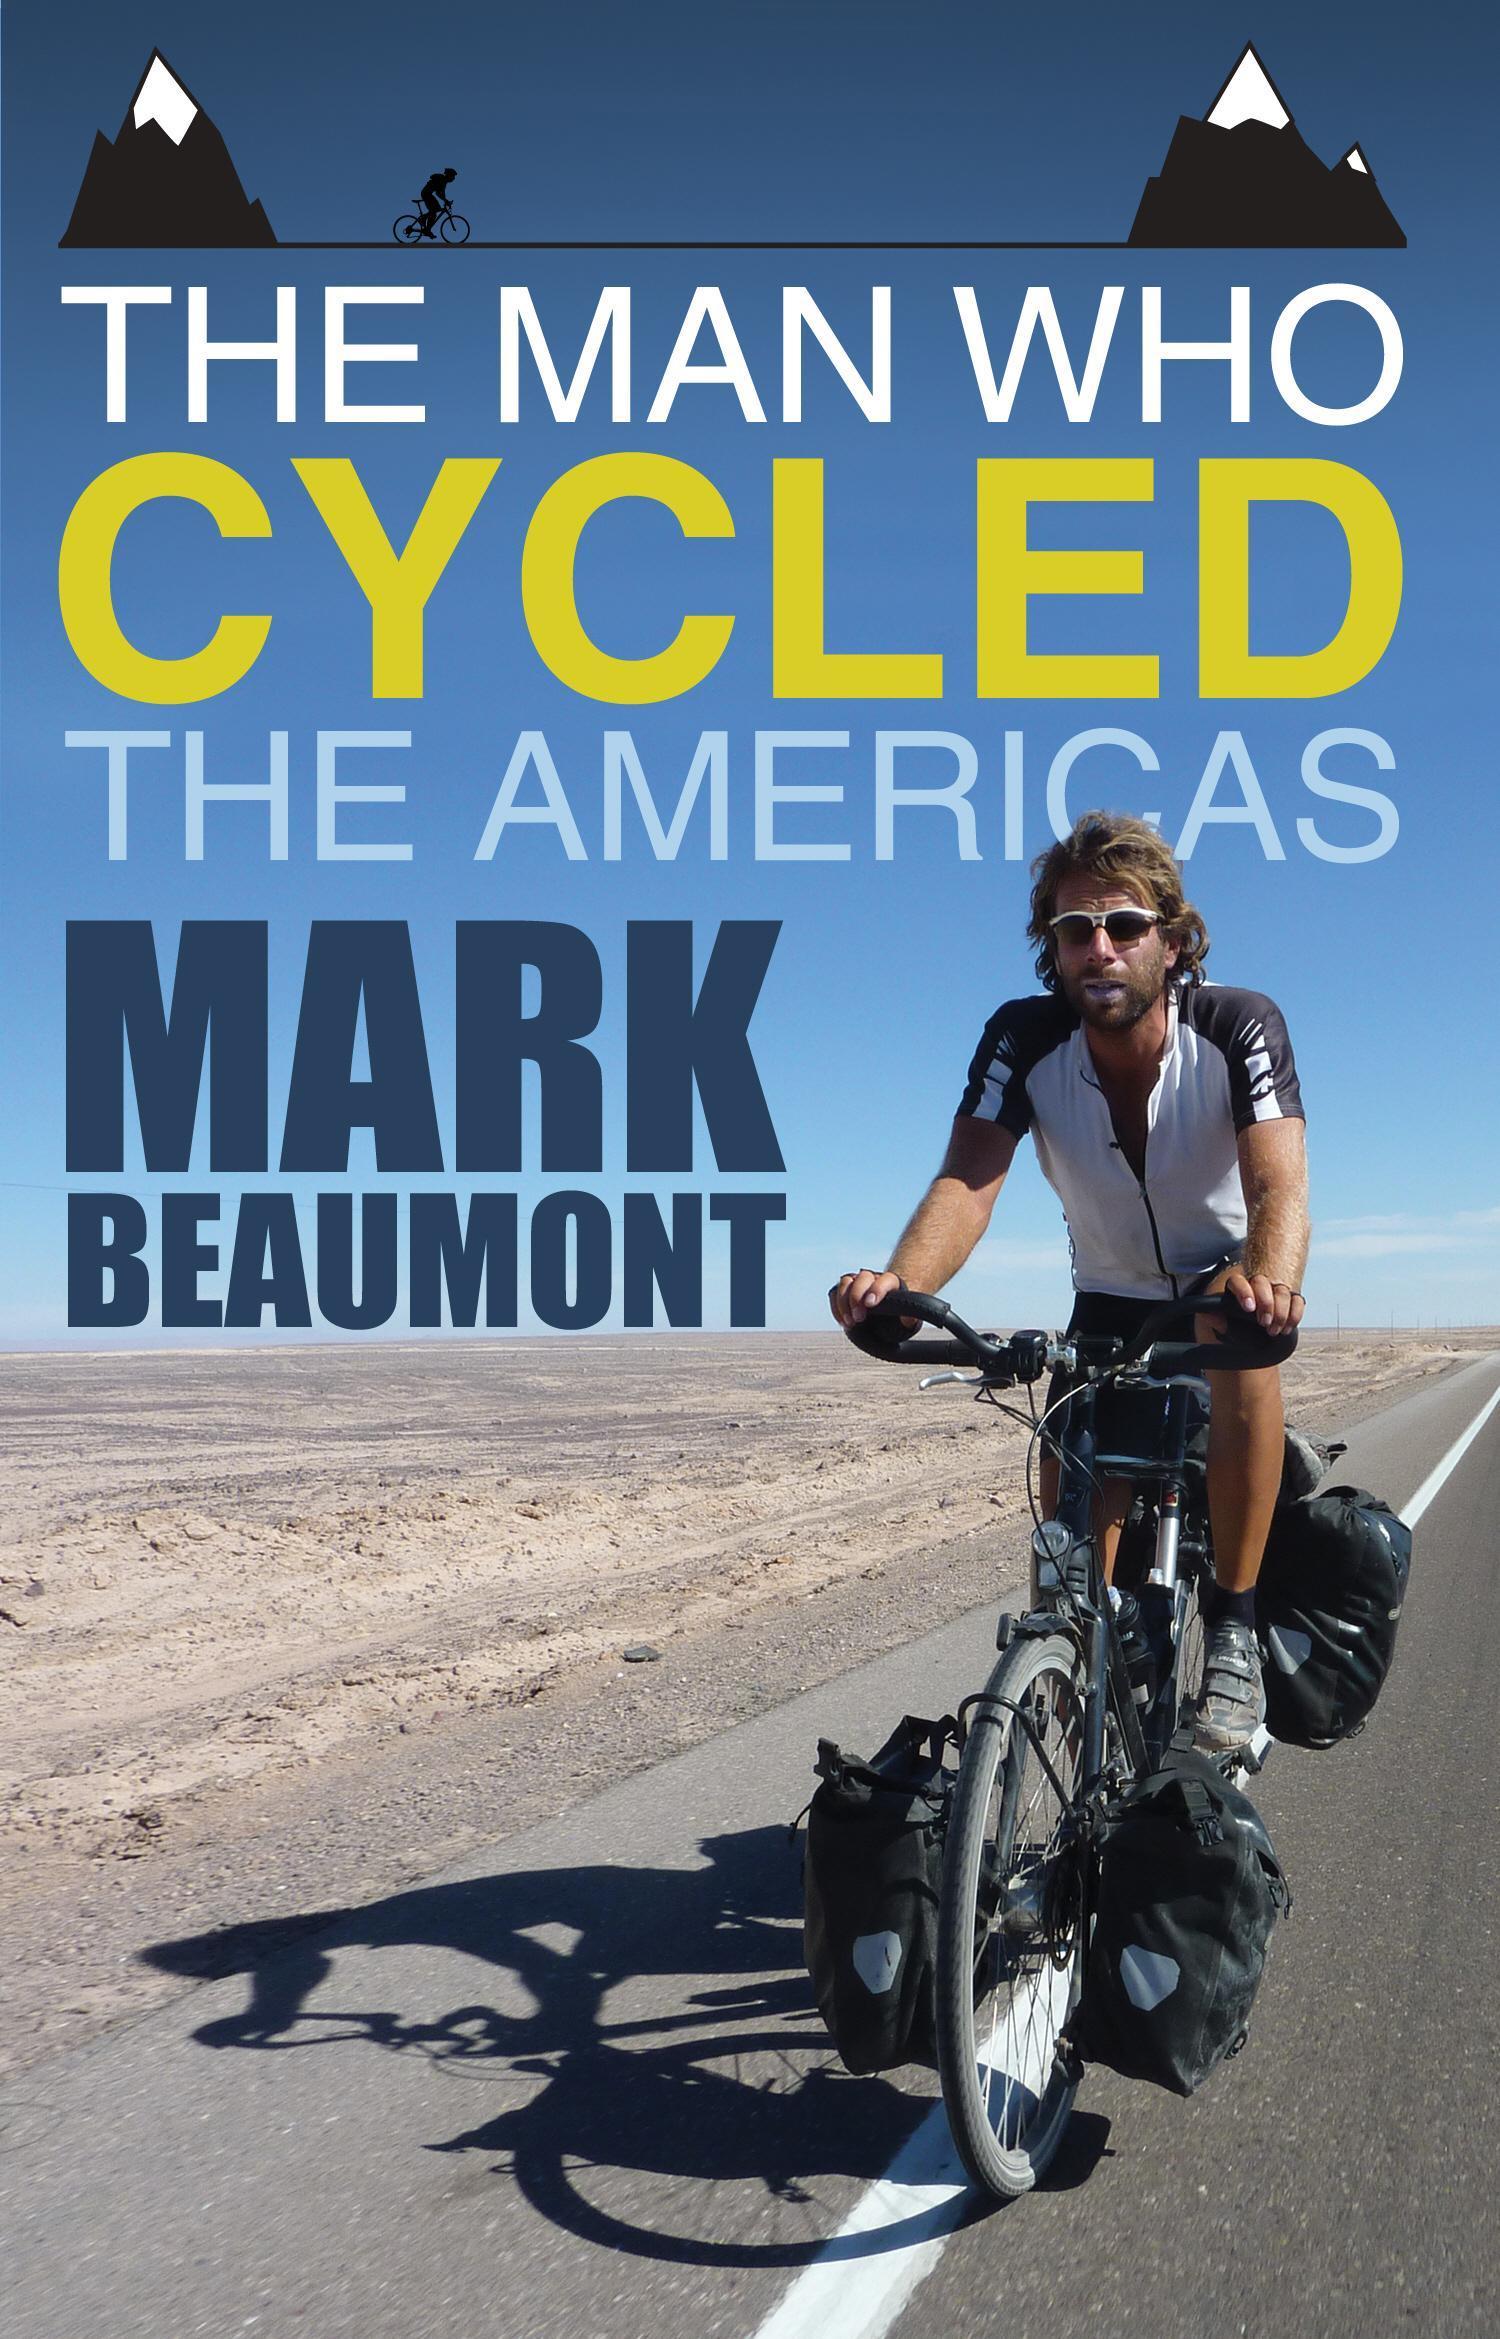 Reisverhaal The Man Who Cycled the Americas | Mark Beaumont <br/>€ 14.50 <br/> <a href='https://www.dezwerver.nl/reisgidsen/?tt=1554_252853_241358_&r=https%3A%2F%2Fwww.dezwerver.nl%2Fr%2Fnoord-amerika%2Fcanada%2Fc%2Fboeken%2Freisverhalen%2F9780552163972%2Freisverhaal-the-man-who-cycled-the-americas-mark-beaumont%2F' target='_blank'>Meer Info</a>